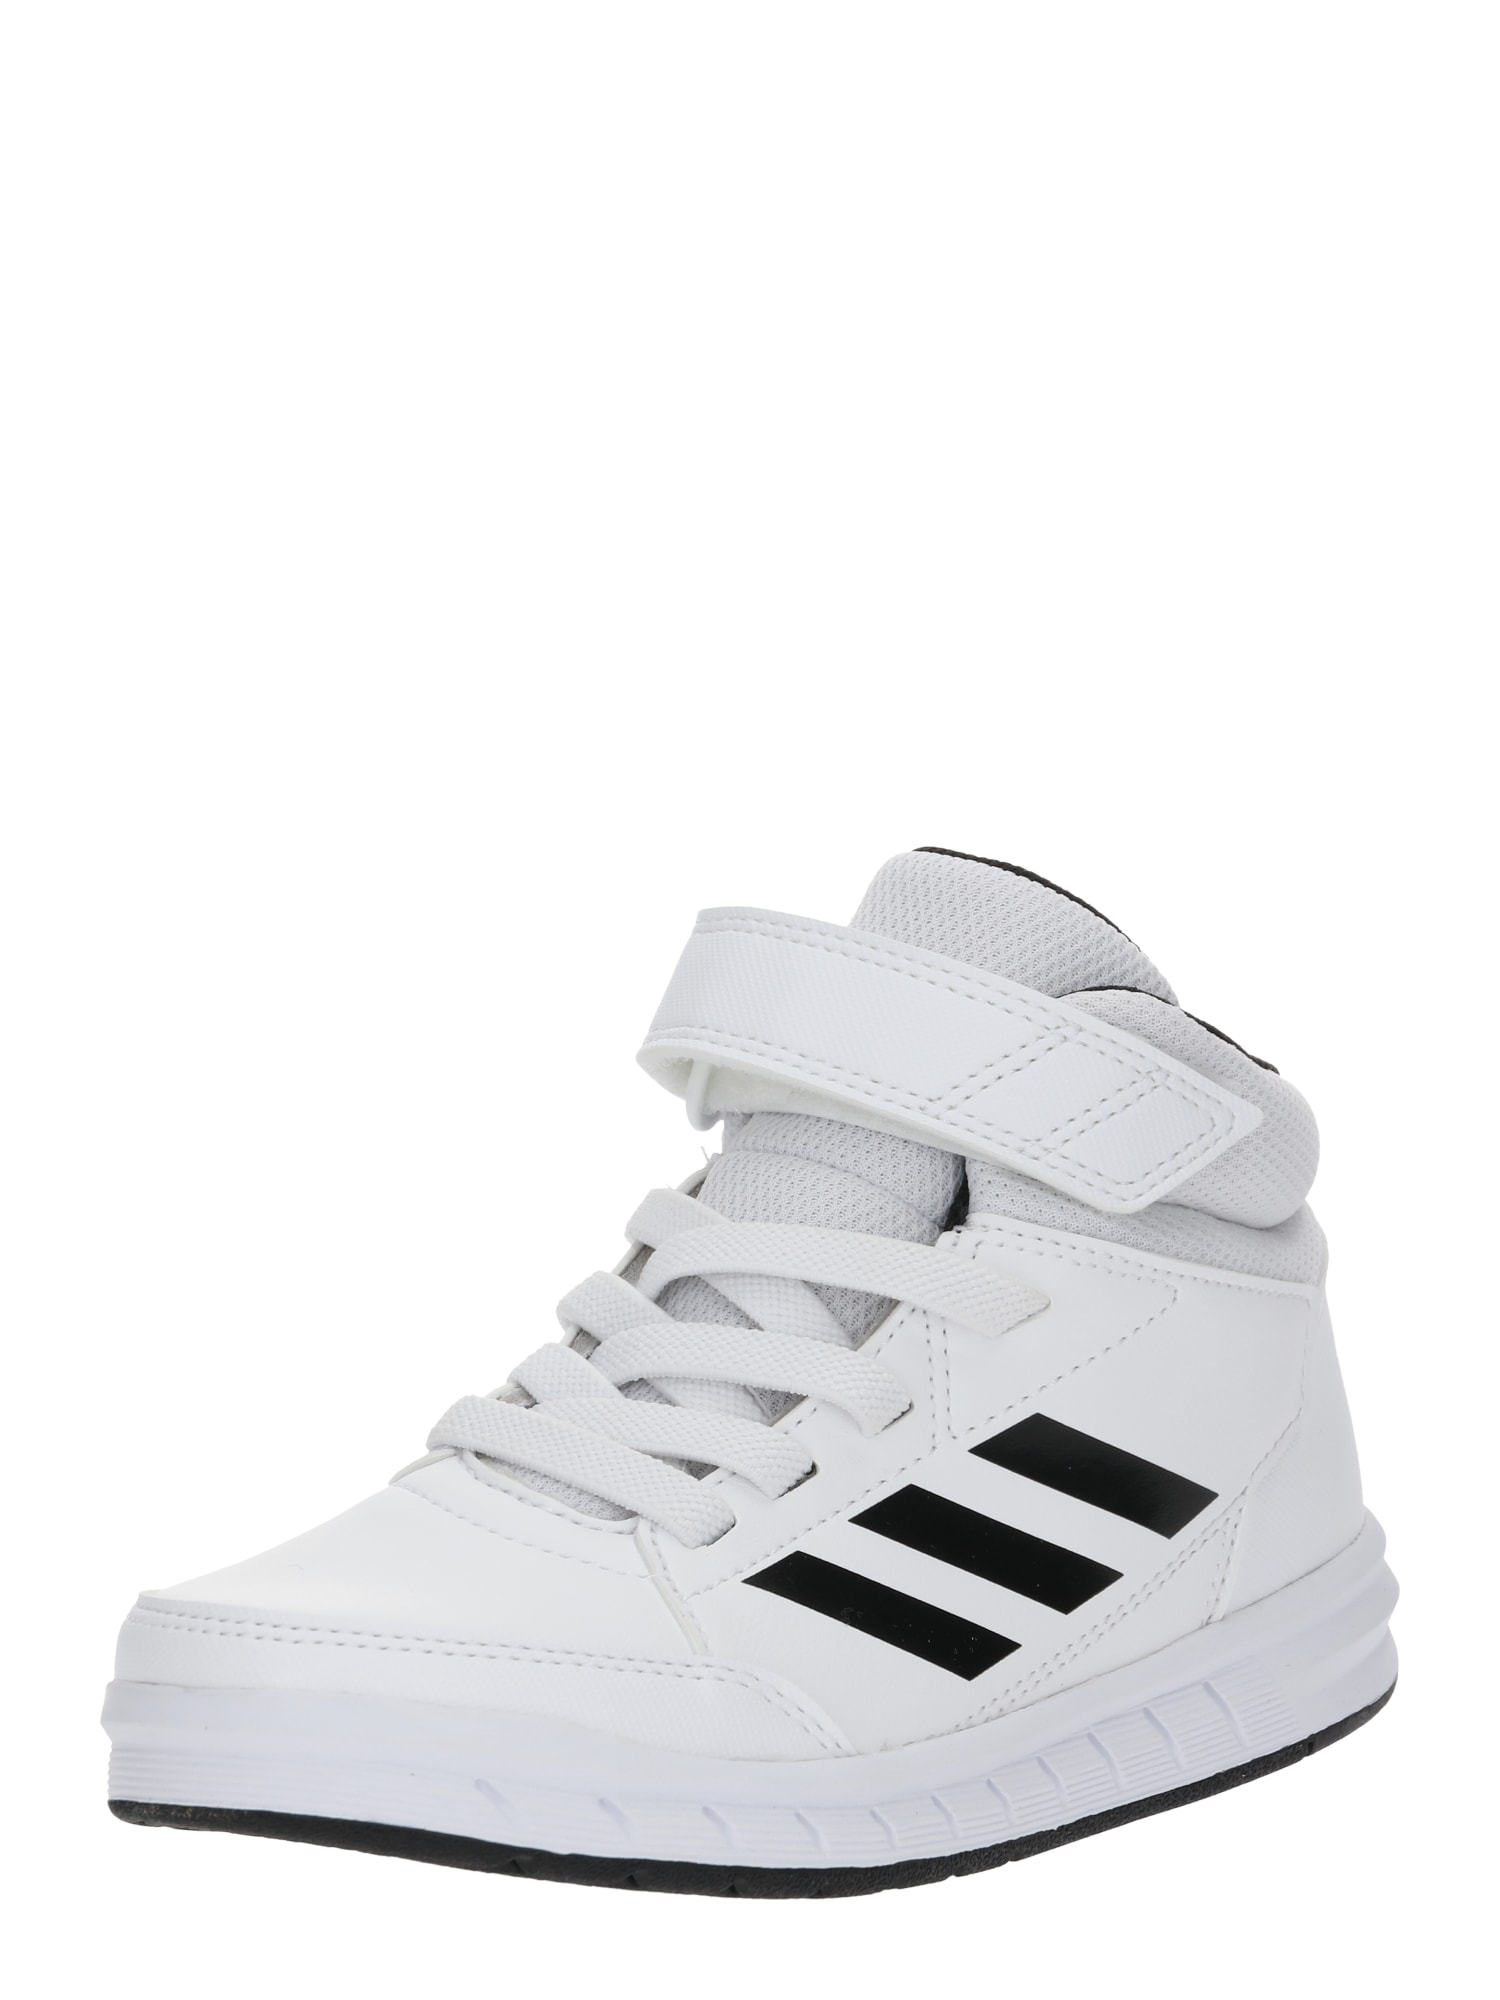 Sportovní boty AltaSport Mid K bílá ADIDAS PERFORMANCE